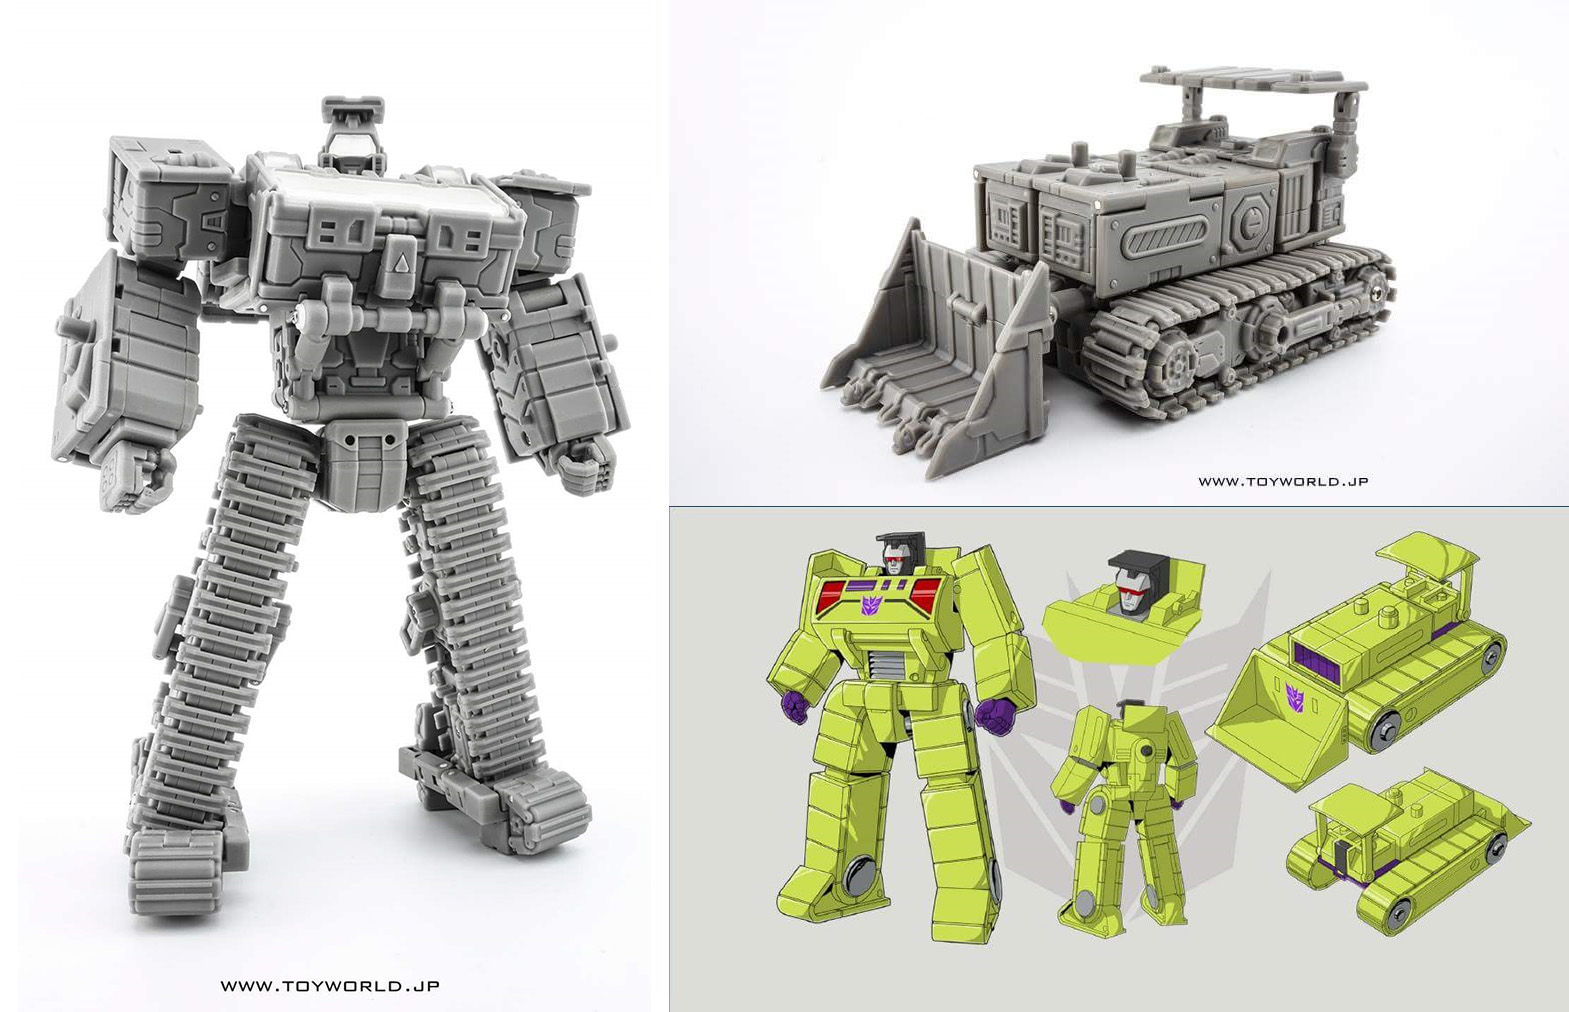 [Toyworld] Produit Tiers - Jouet TW-C Constructor aka Devastator/Dévastateur (Version vert G1 et jaune G2) - Page 2 GyN54n33